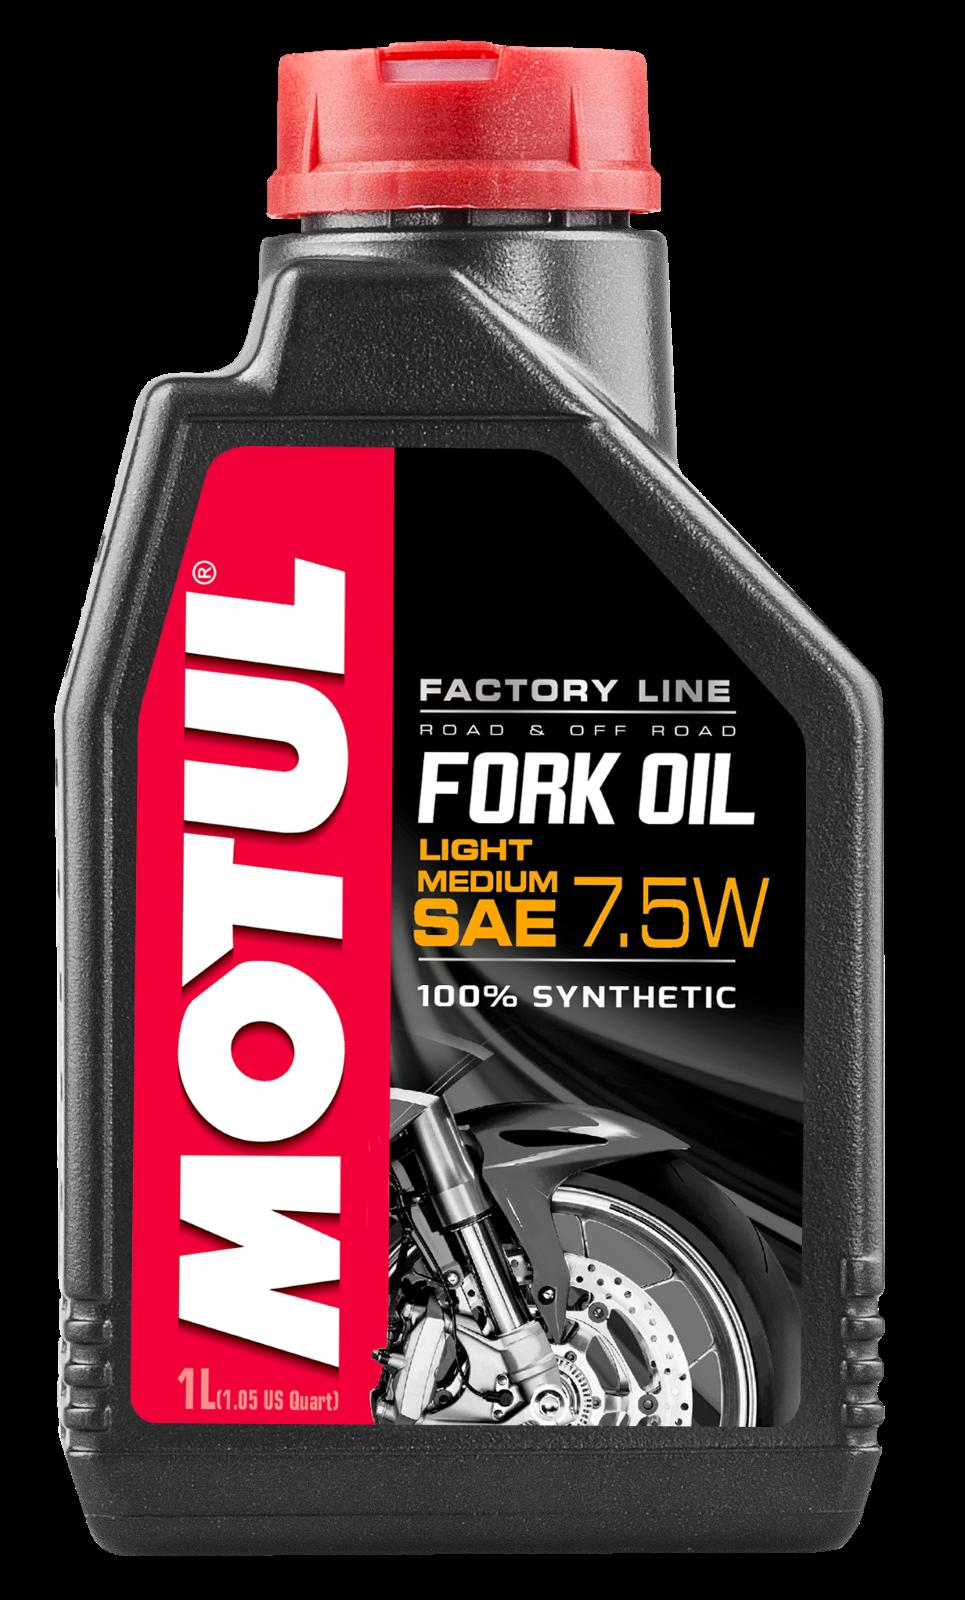 MOTUL AG MOTUL Fork Oil Factory Line 7.5W Teleszkóp olaj, villaolaj